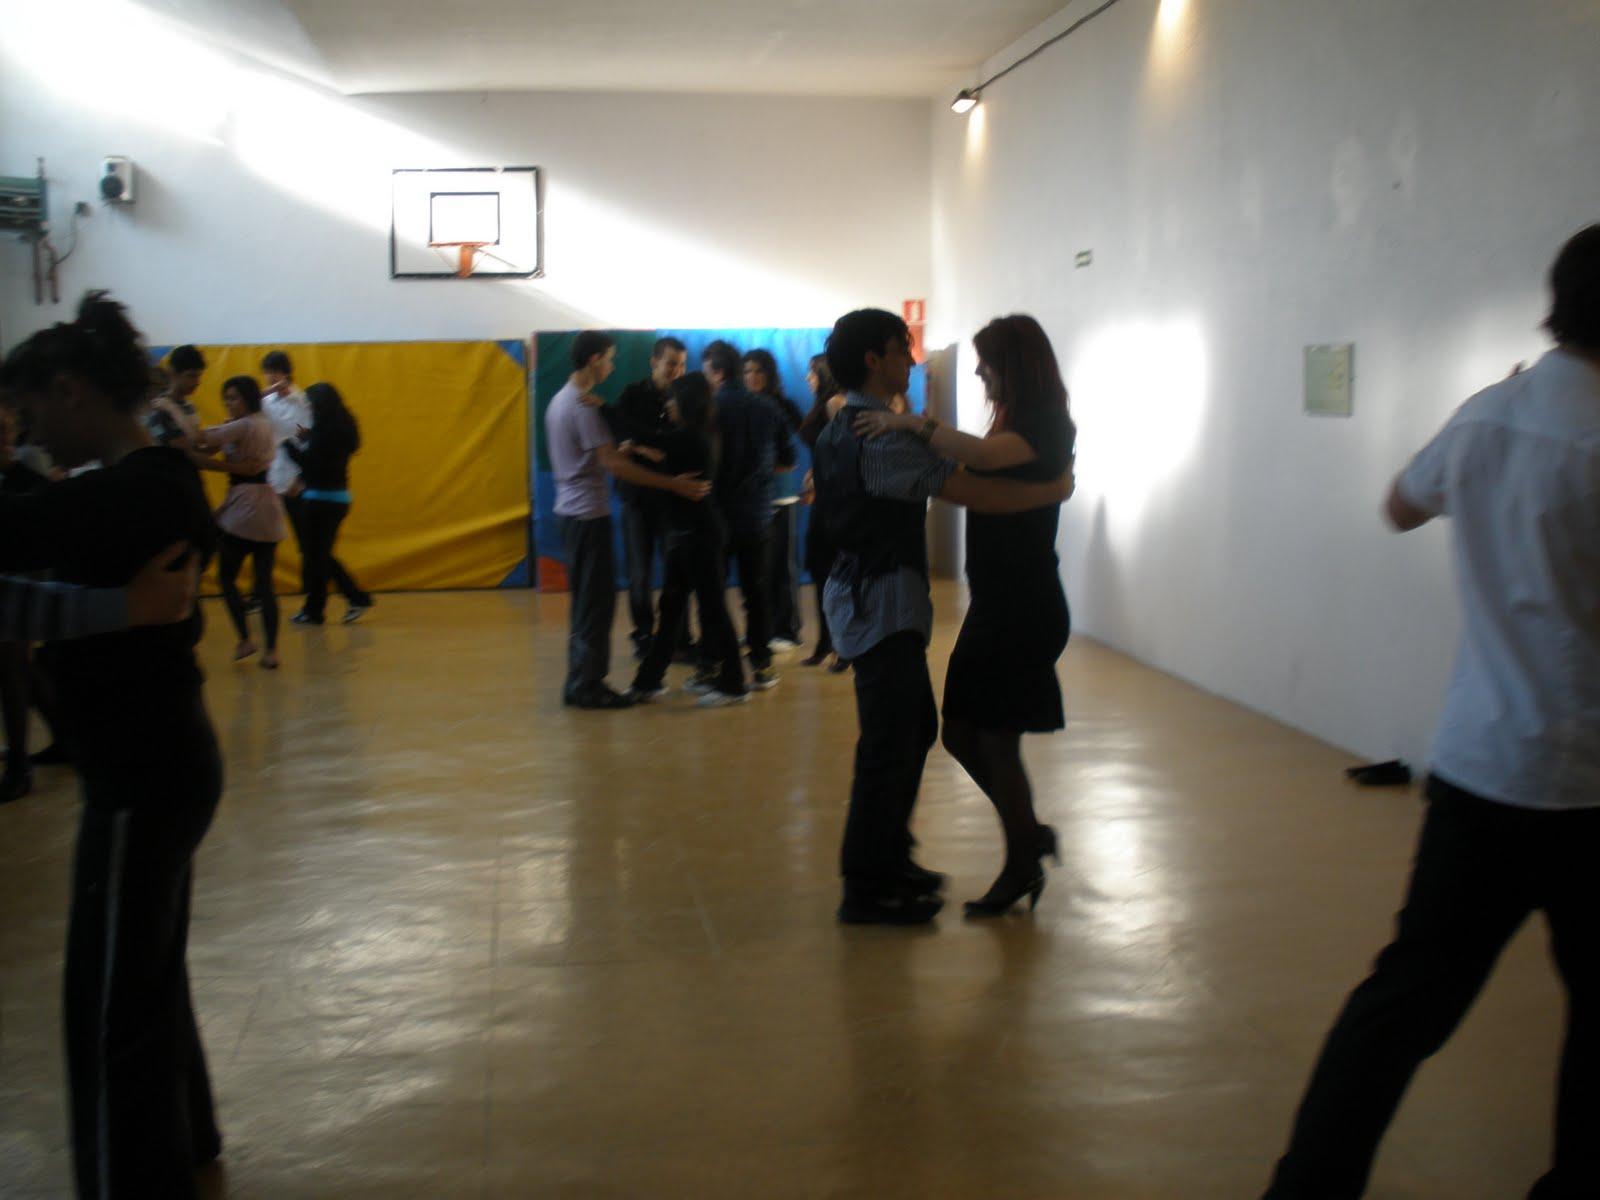 prostitutas españolas madrid imagenes de trata de mujeres